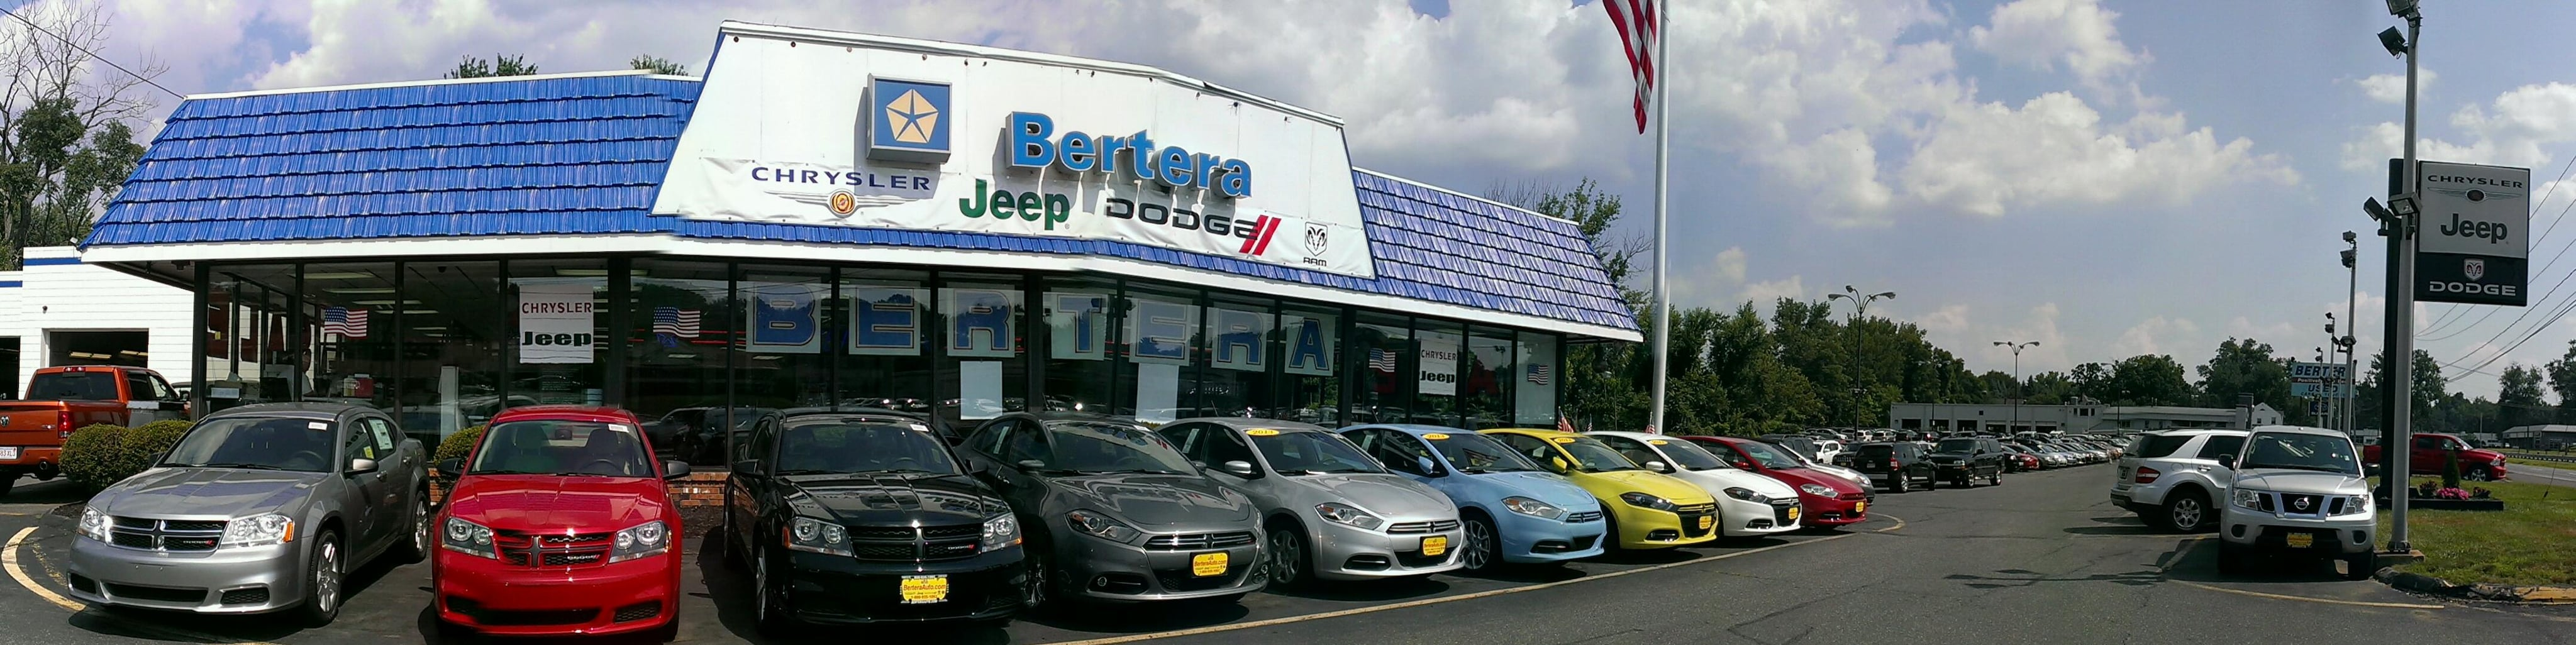 Bertera Chrysler Jeep Dodge West Springfield – My Bike Journey Gallery